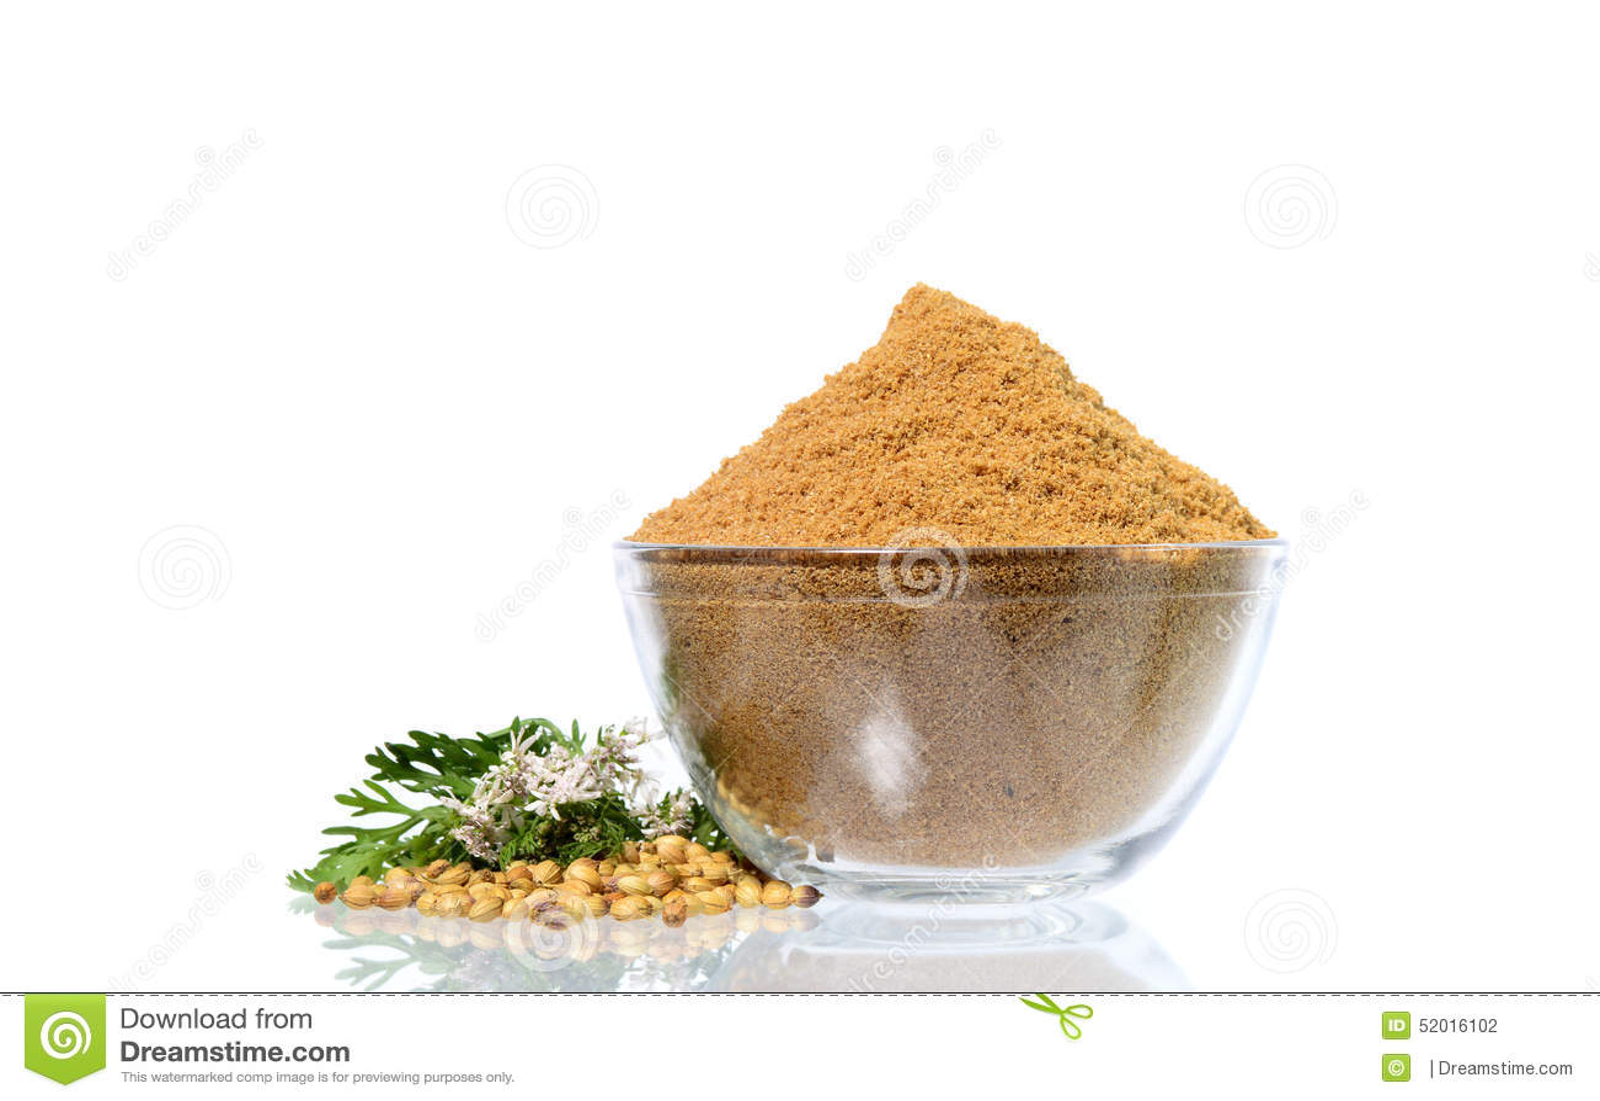 Semillas de coriandro, coriandro fresco y coriandro pulverizado